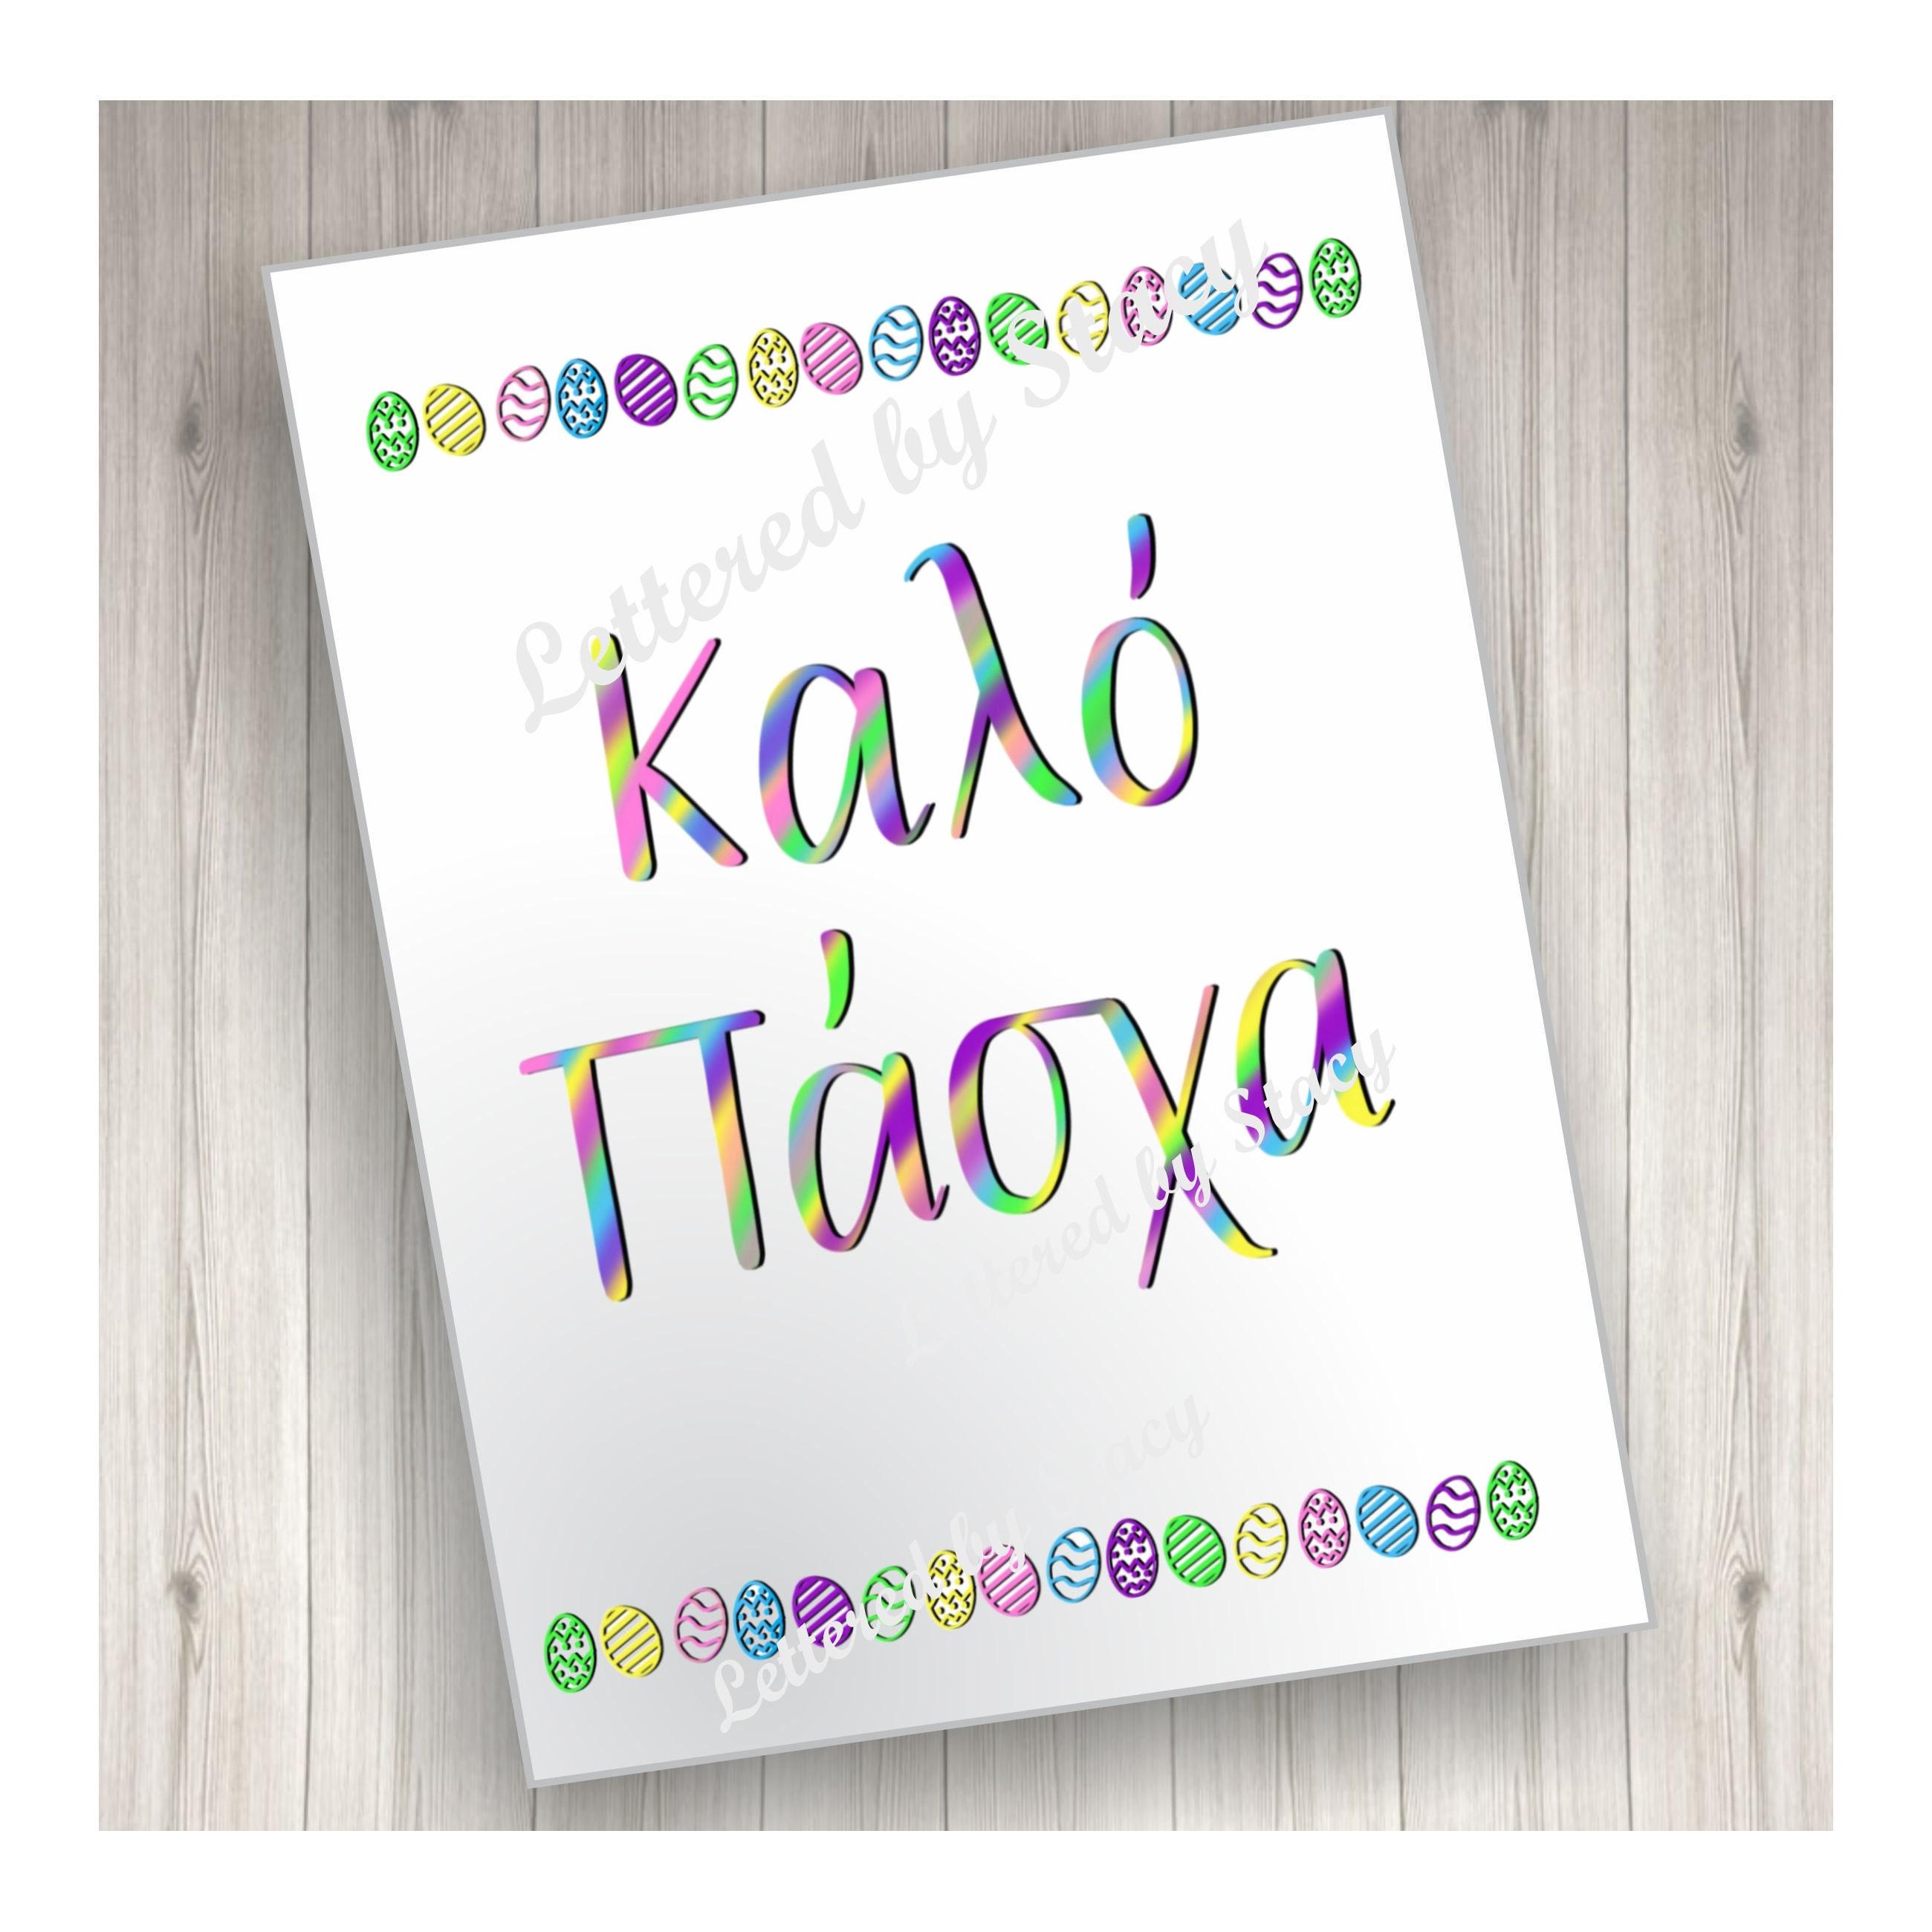 Kalo Pascha Card Greek Easter Card Downloadable Card Etsy